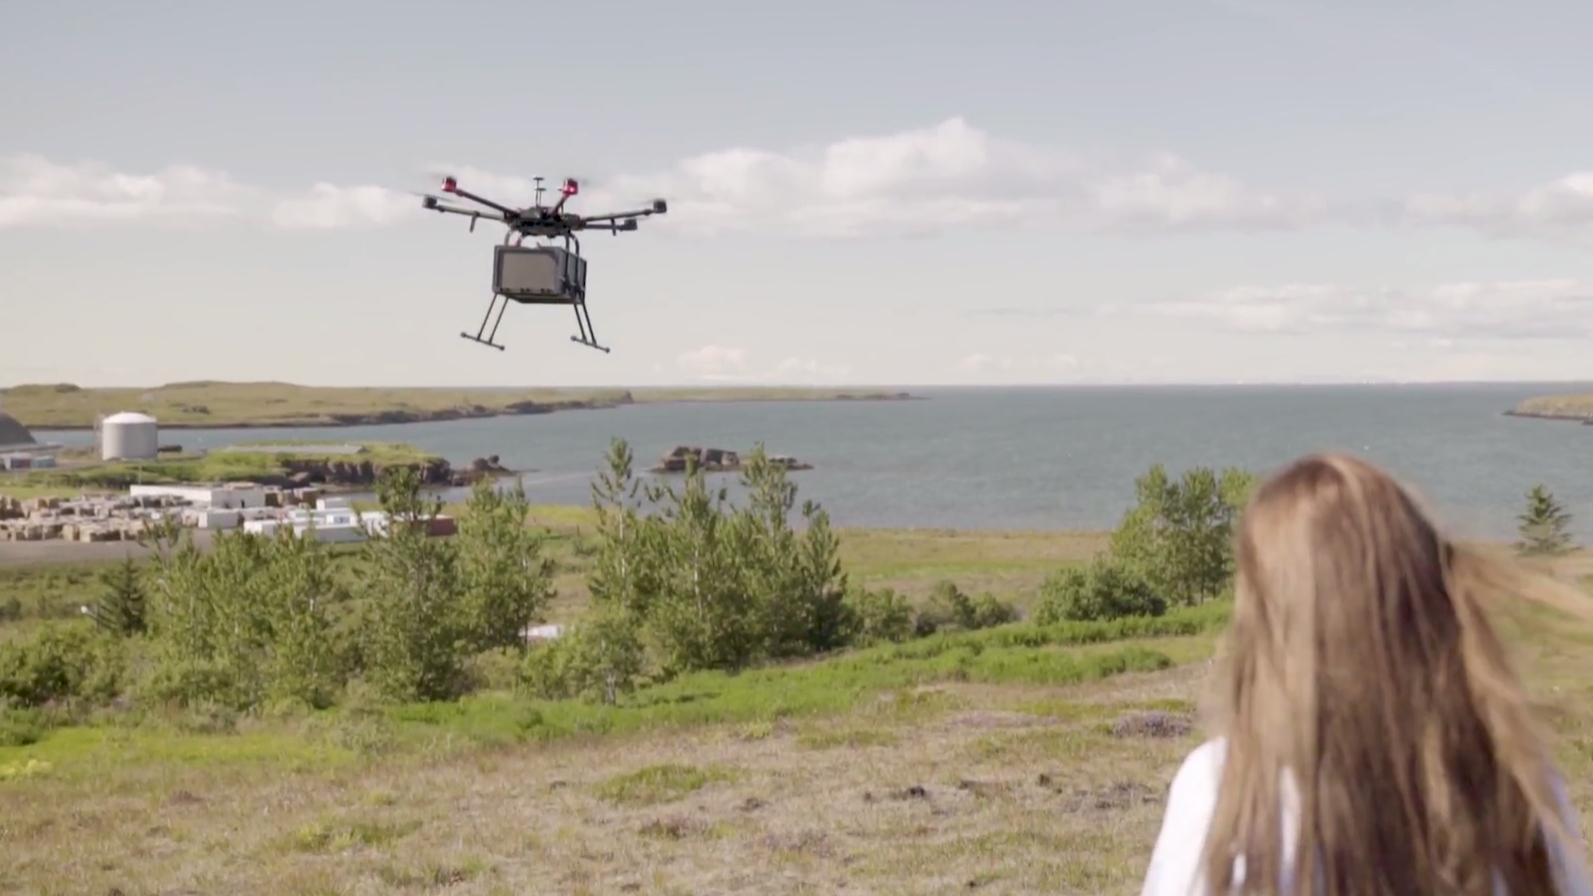 Island er første land i Norden som tester ut dronelevering i større skala